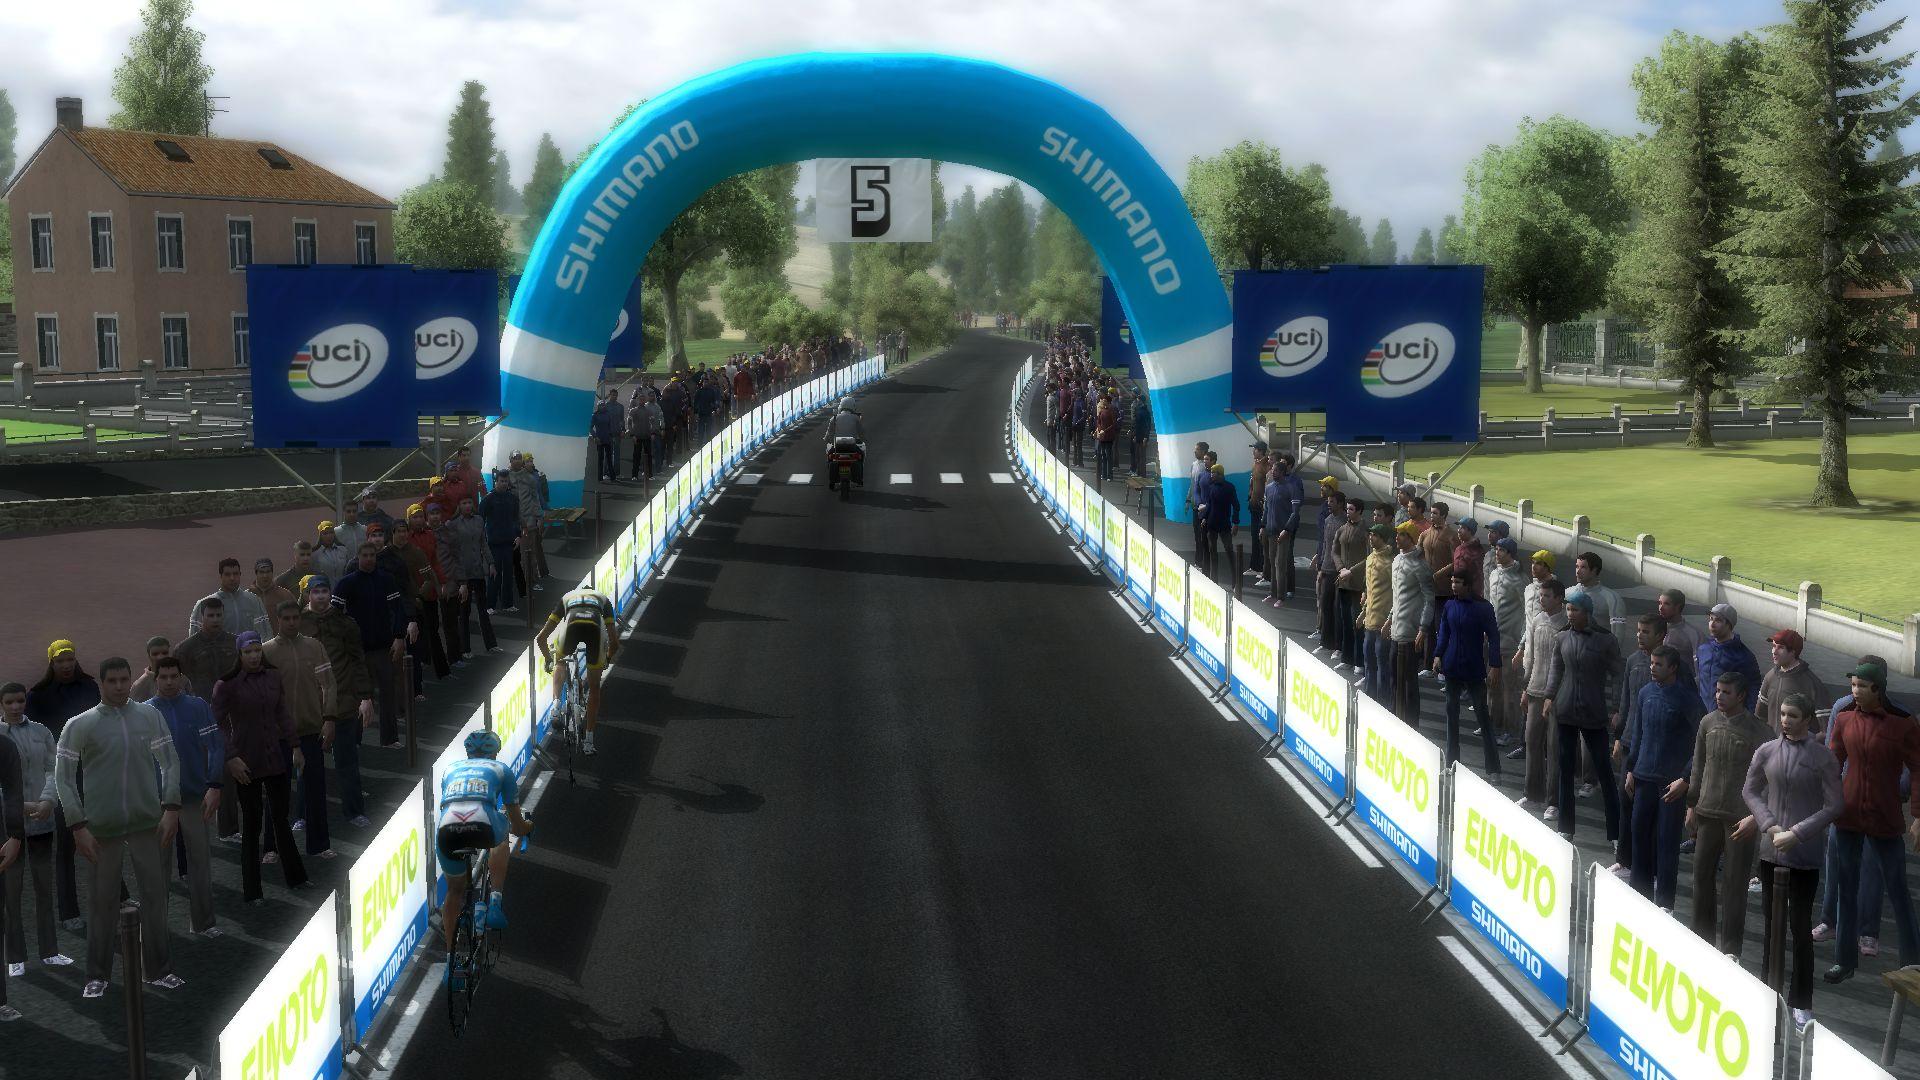 pcmdaily.com/images/mg/2017/Races/PT/TONE/TNES3%2021.jpg